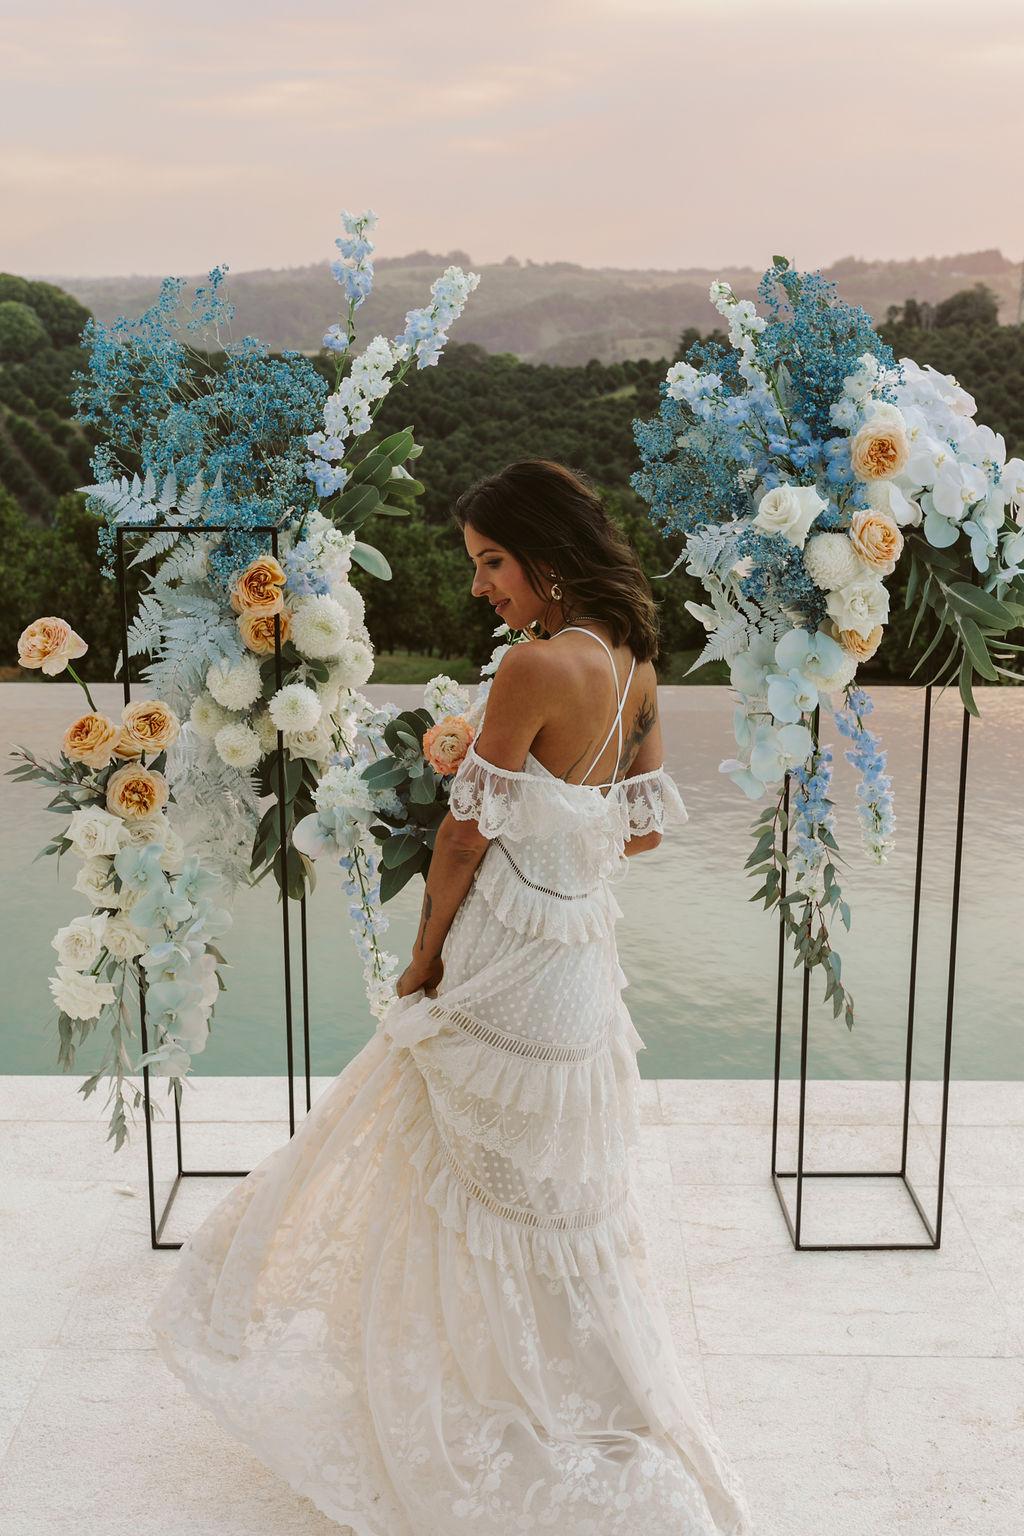 Bride standing at flower arrangement at sunset / Byron Bath House Wedding